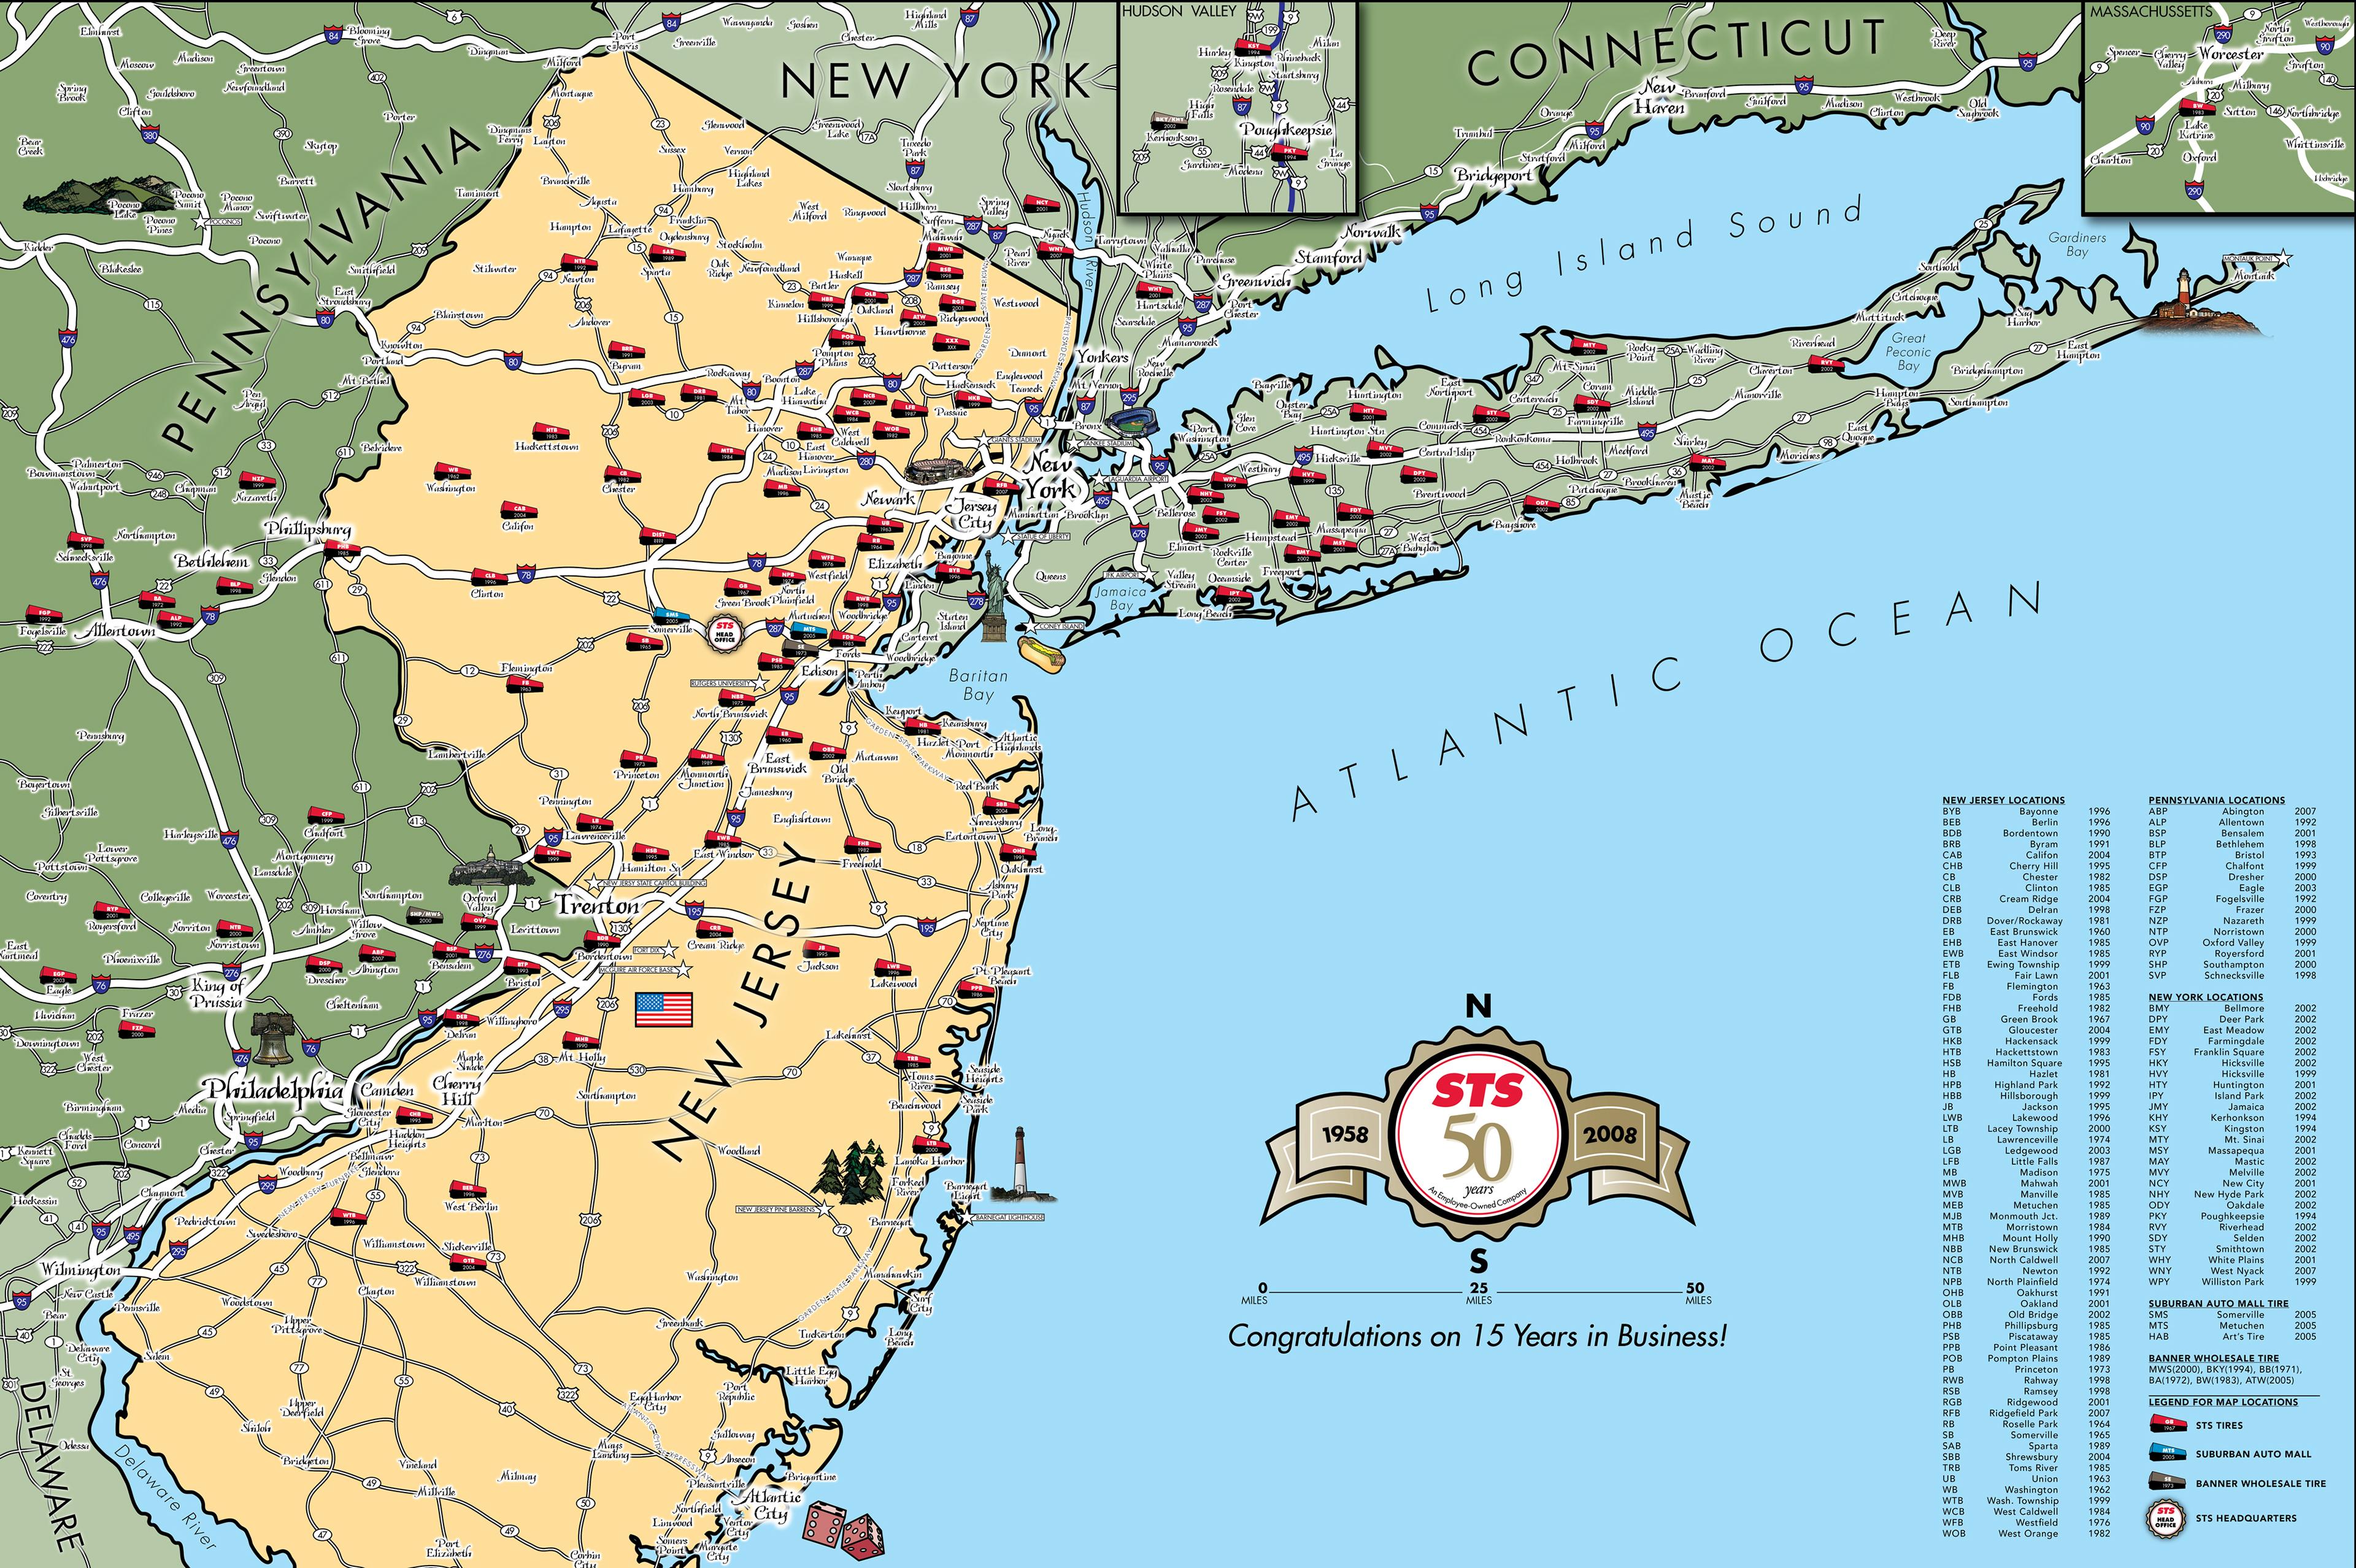 Eric Olason Mapmaker Cartographic Artist – Map of Greater New York City Area